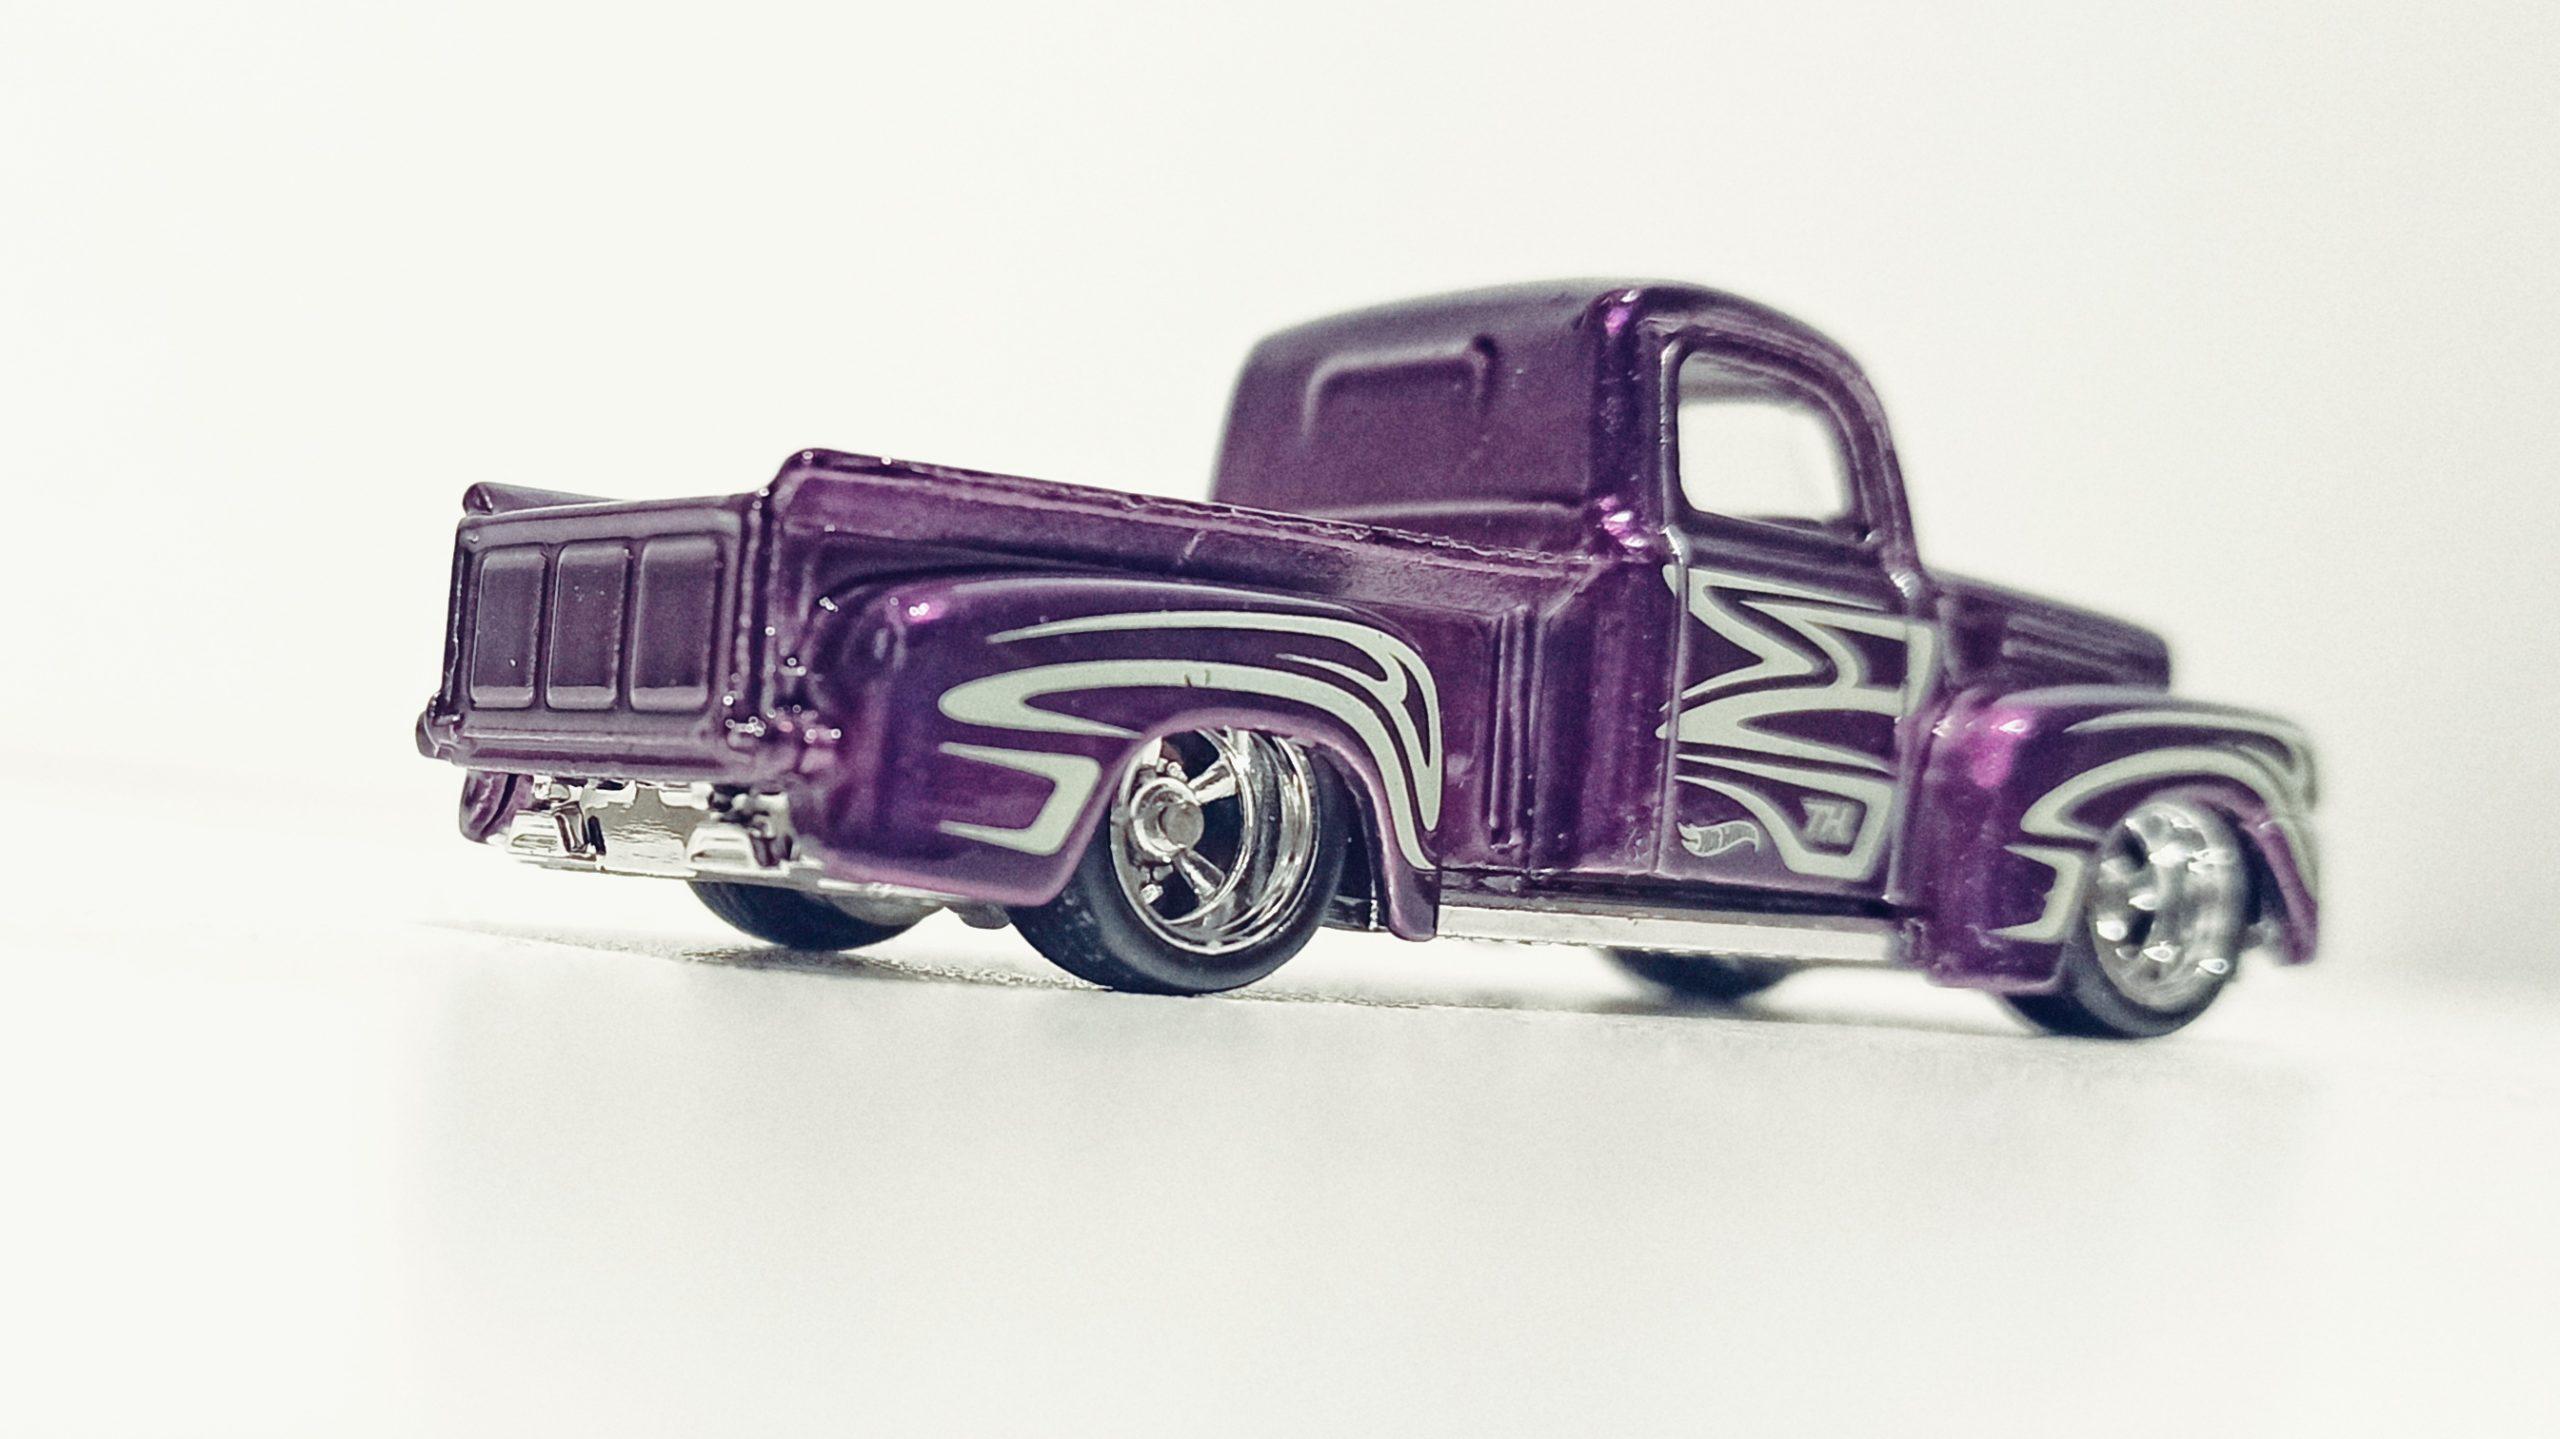 Hot Wheels '49 Ford F1 (GTD03) 2021 (225/250) HW Hot Trucks (6/10) spectraflame purple Super Treasure Hunt (STH) side angle